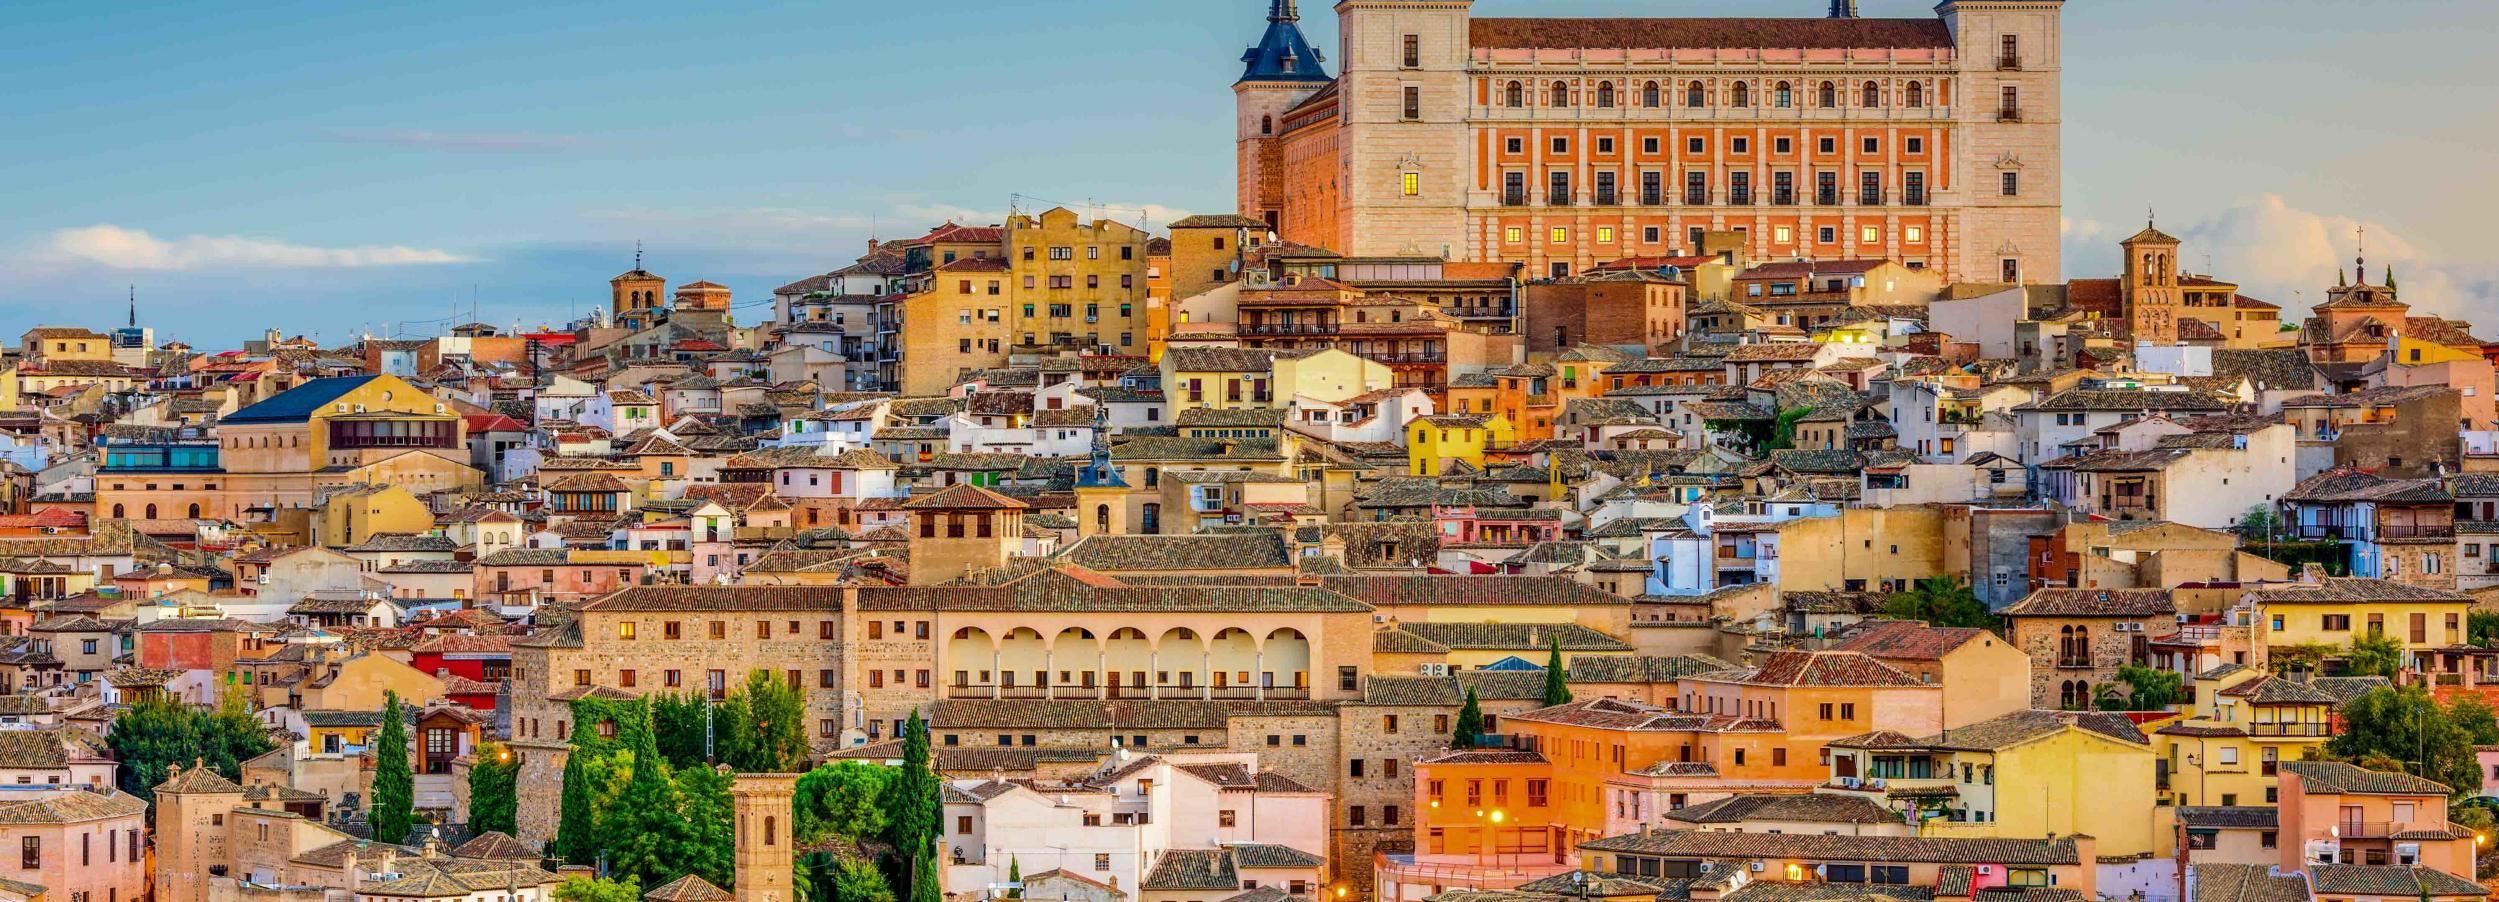 Madrid: Toledo Full Day Tour with Free Madrid City Tour